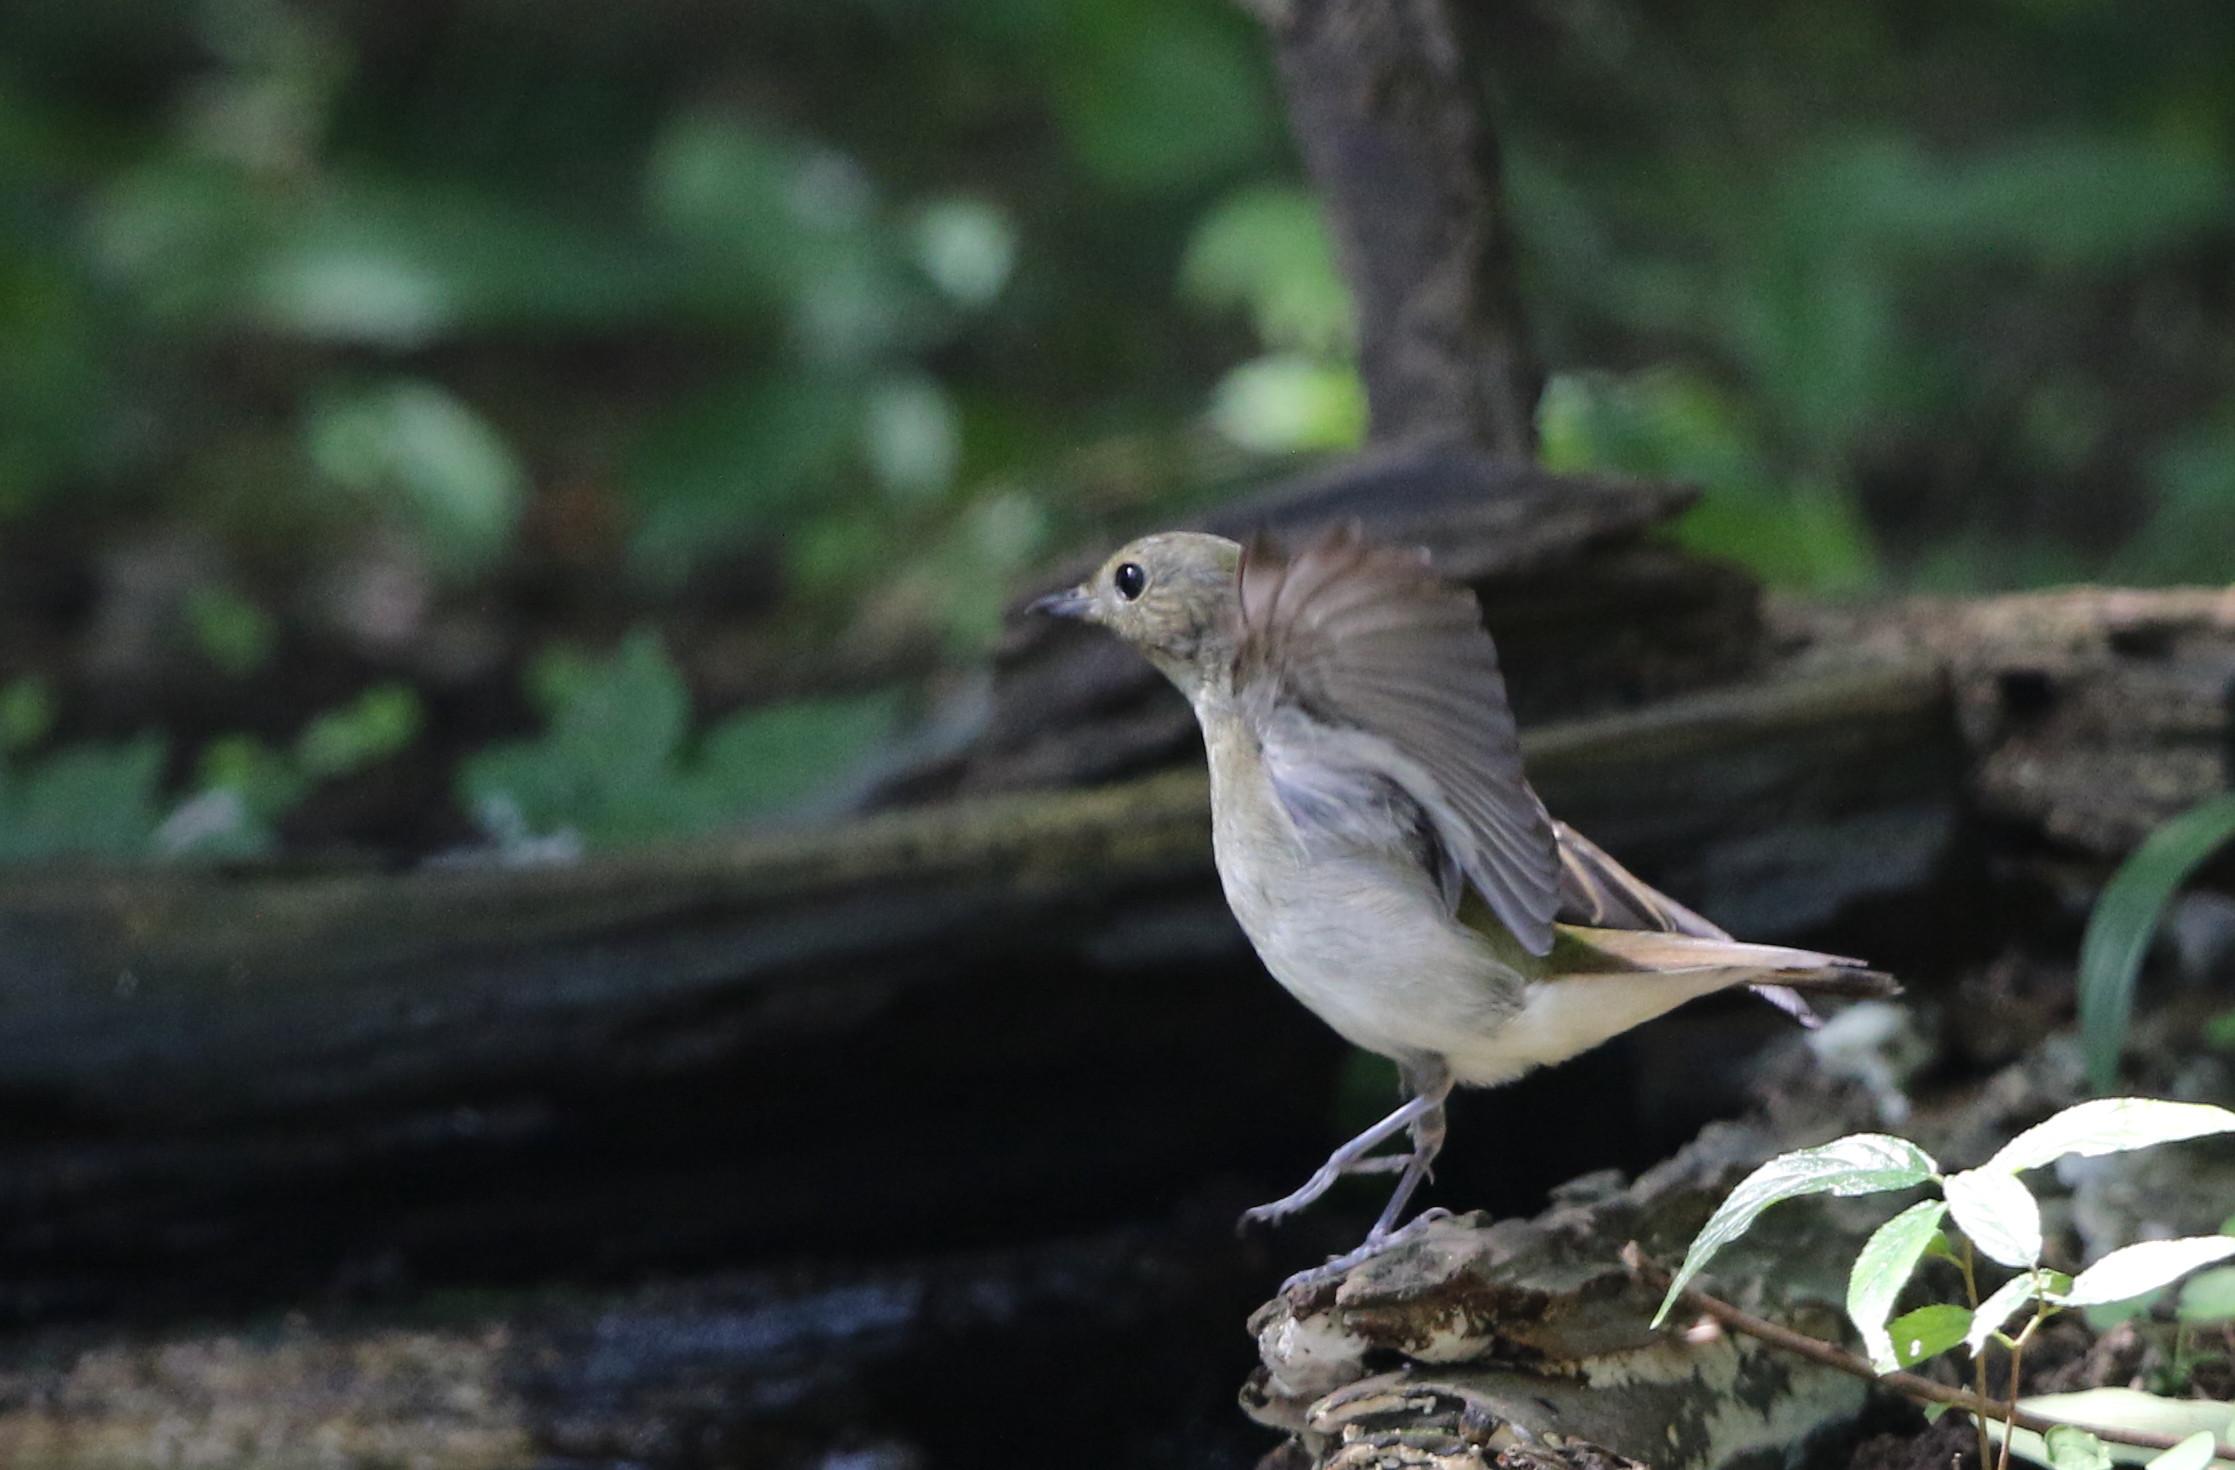 MFの森の水場にてキビタキ2羽幼鳥?_f0239515_15201922.jpg